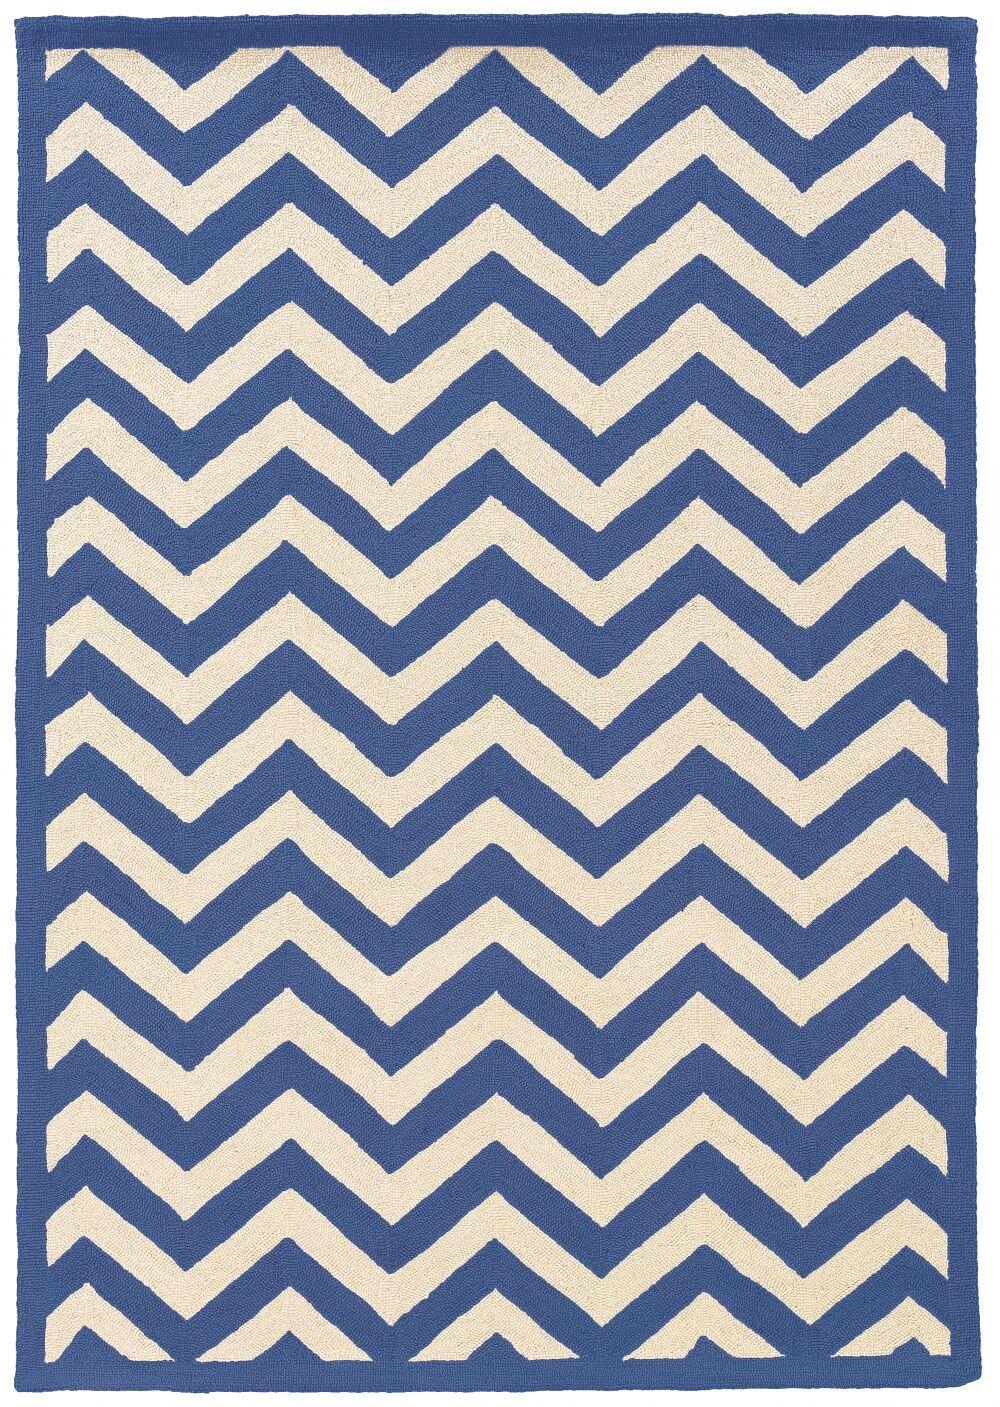 Hand-Hooked Blue/Ivory Area Rug Rug Size: Rectangle 8' x 10'